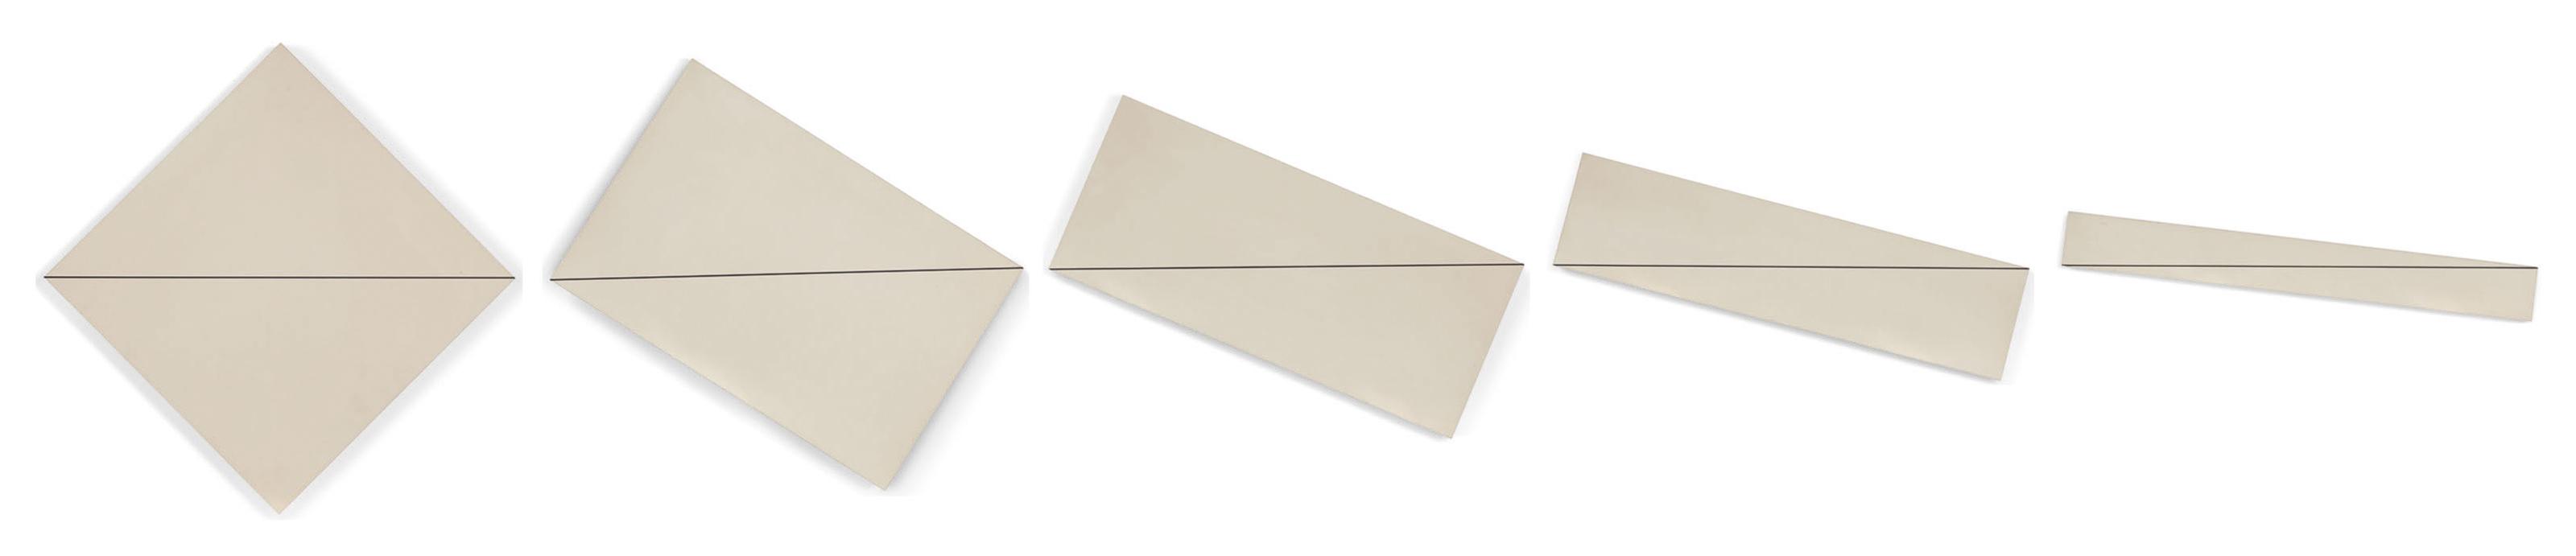 Diagonale-horizontale (Diagonal-Horizontal)